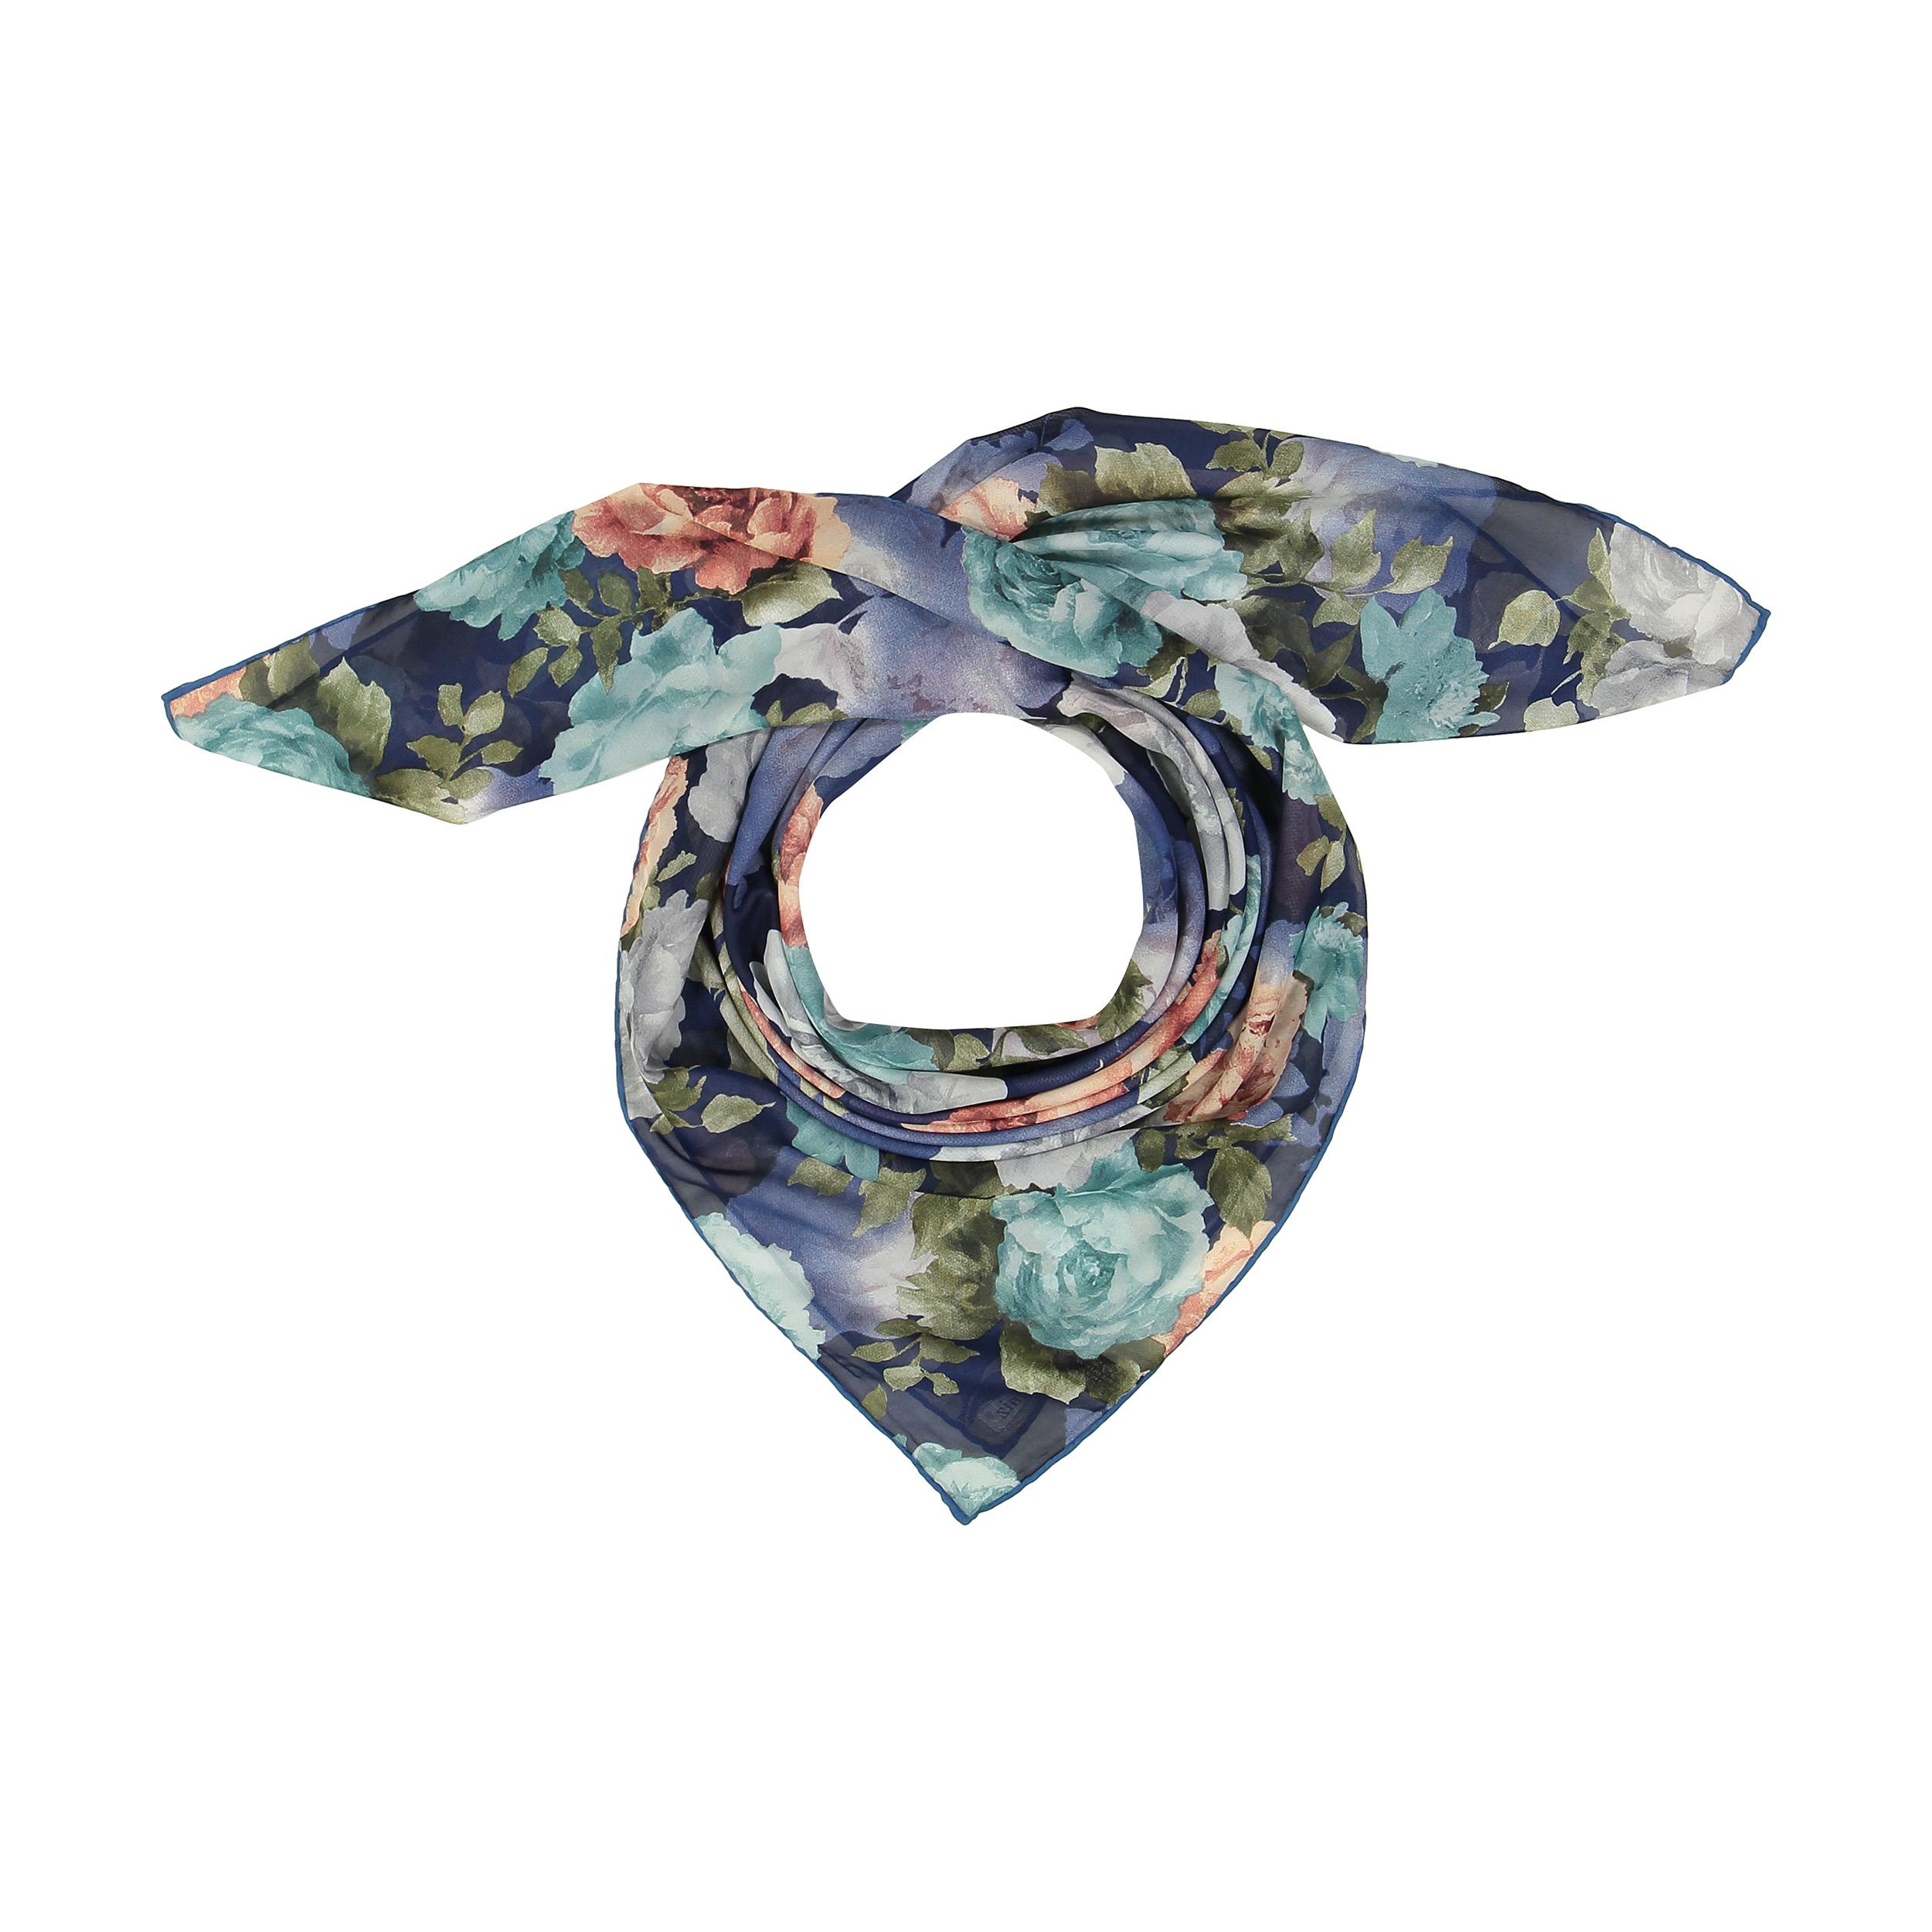 روسری زنانه لمیز طرح گلستان کد 357